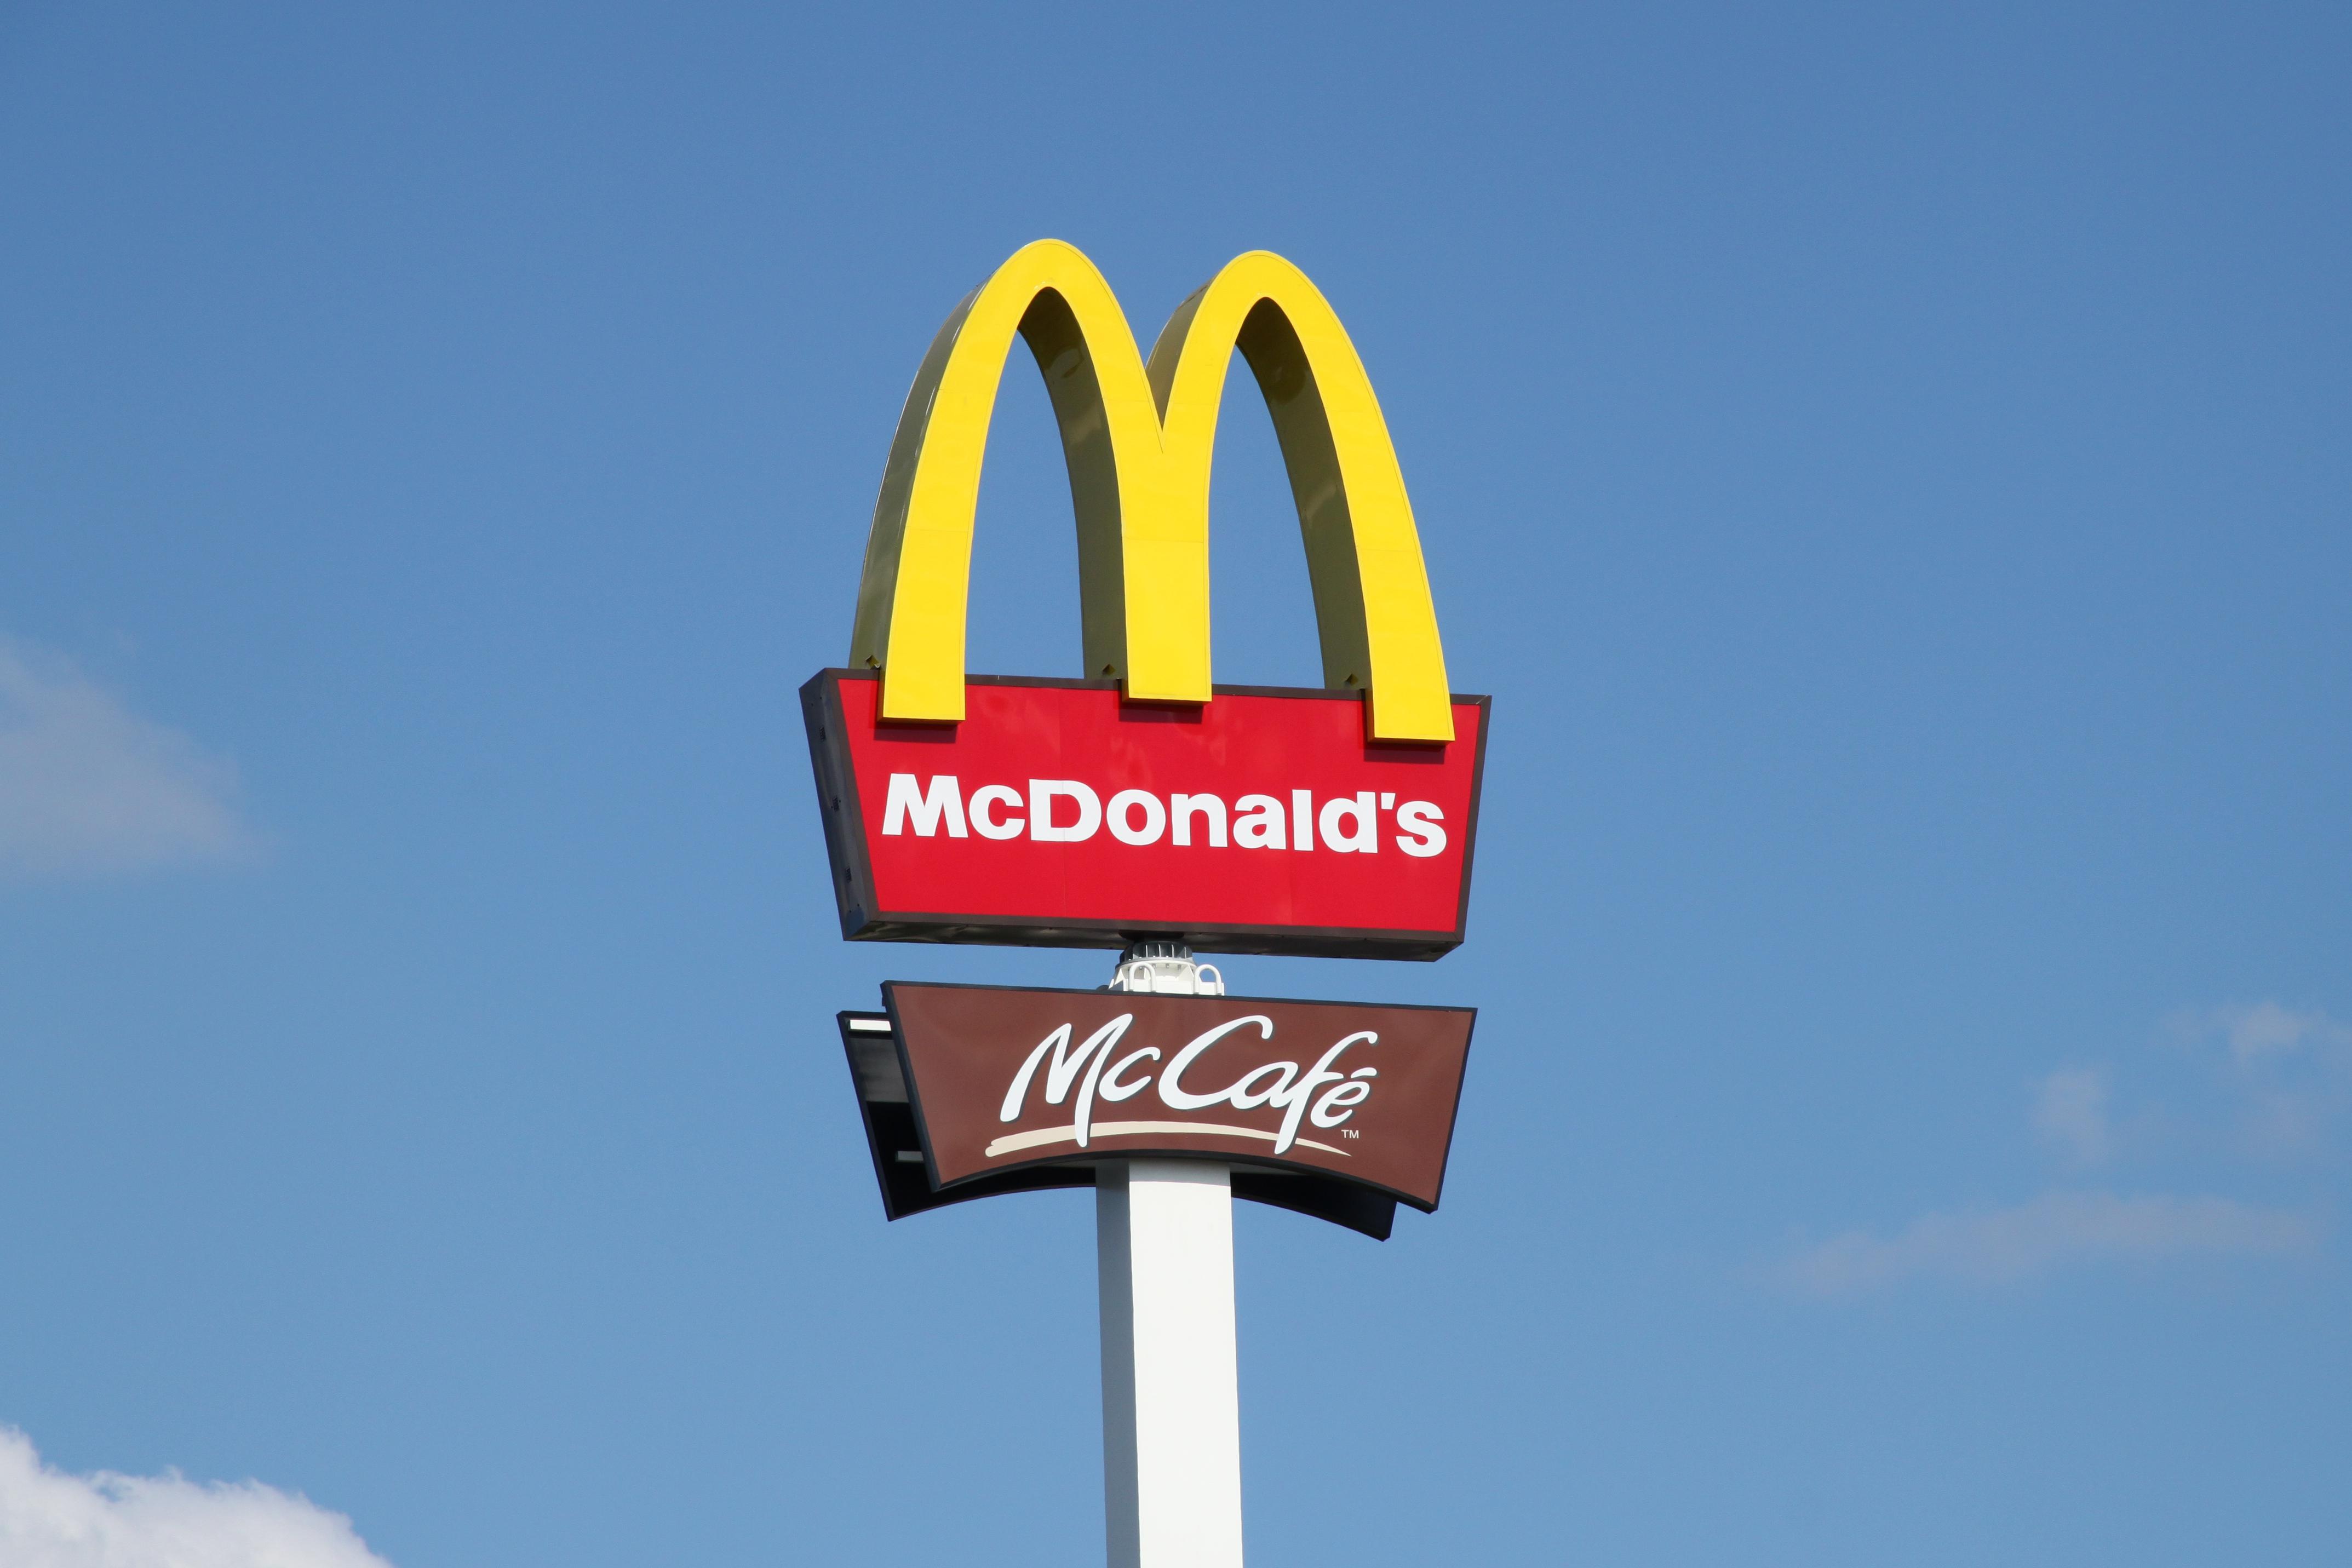 File:McDonald's logo Targówek.JPG - Wikimedia Commons